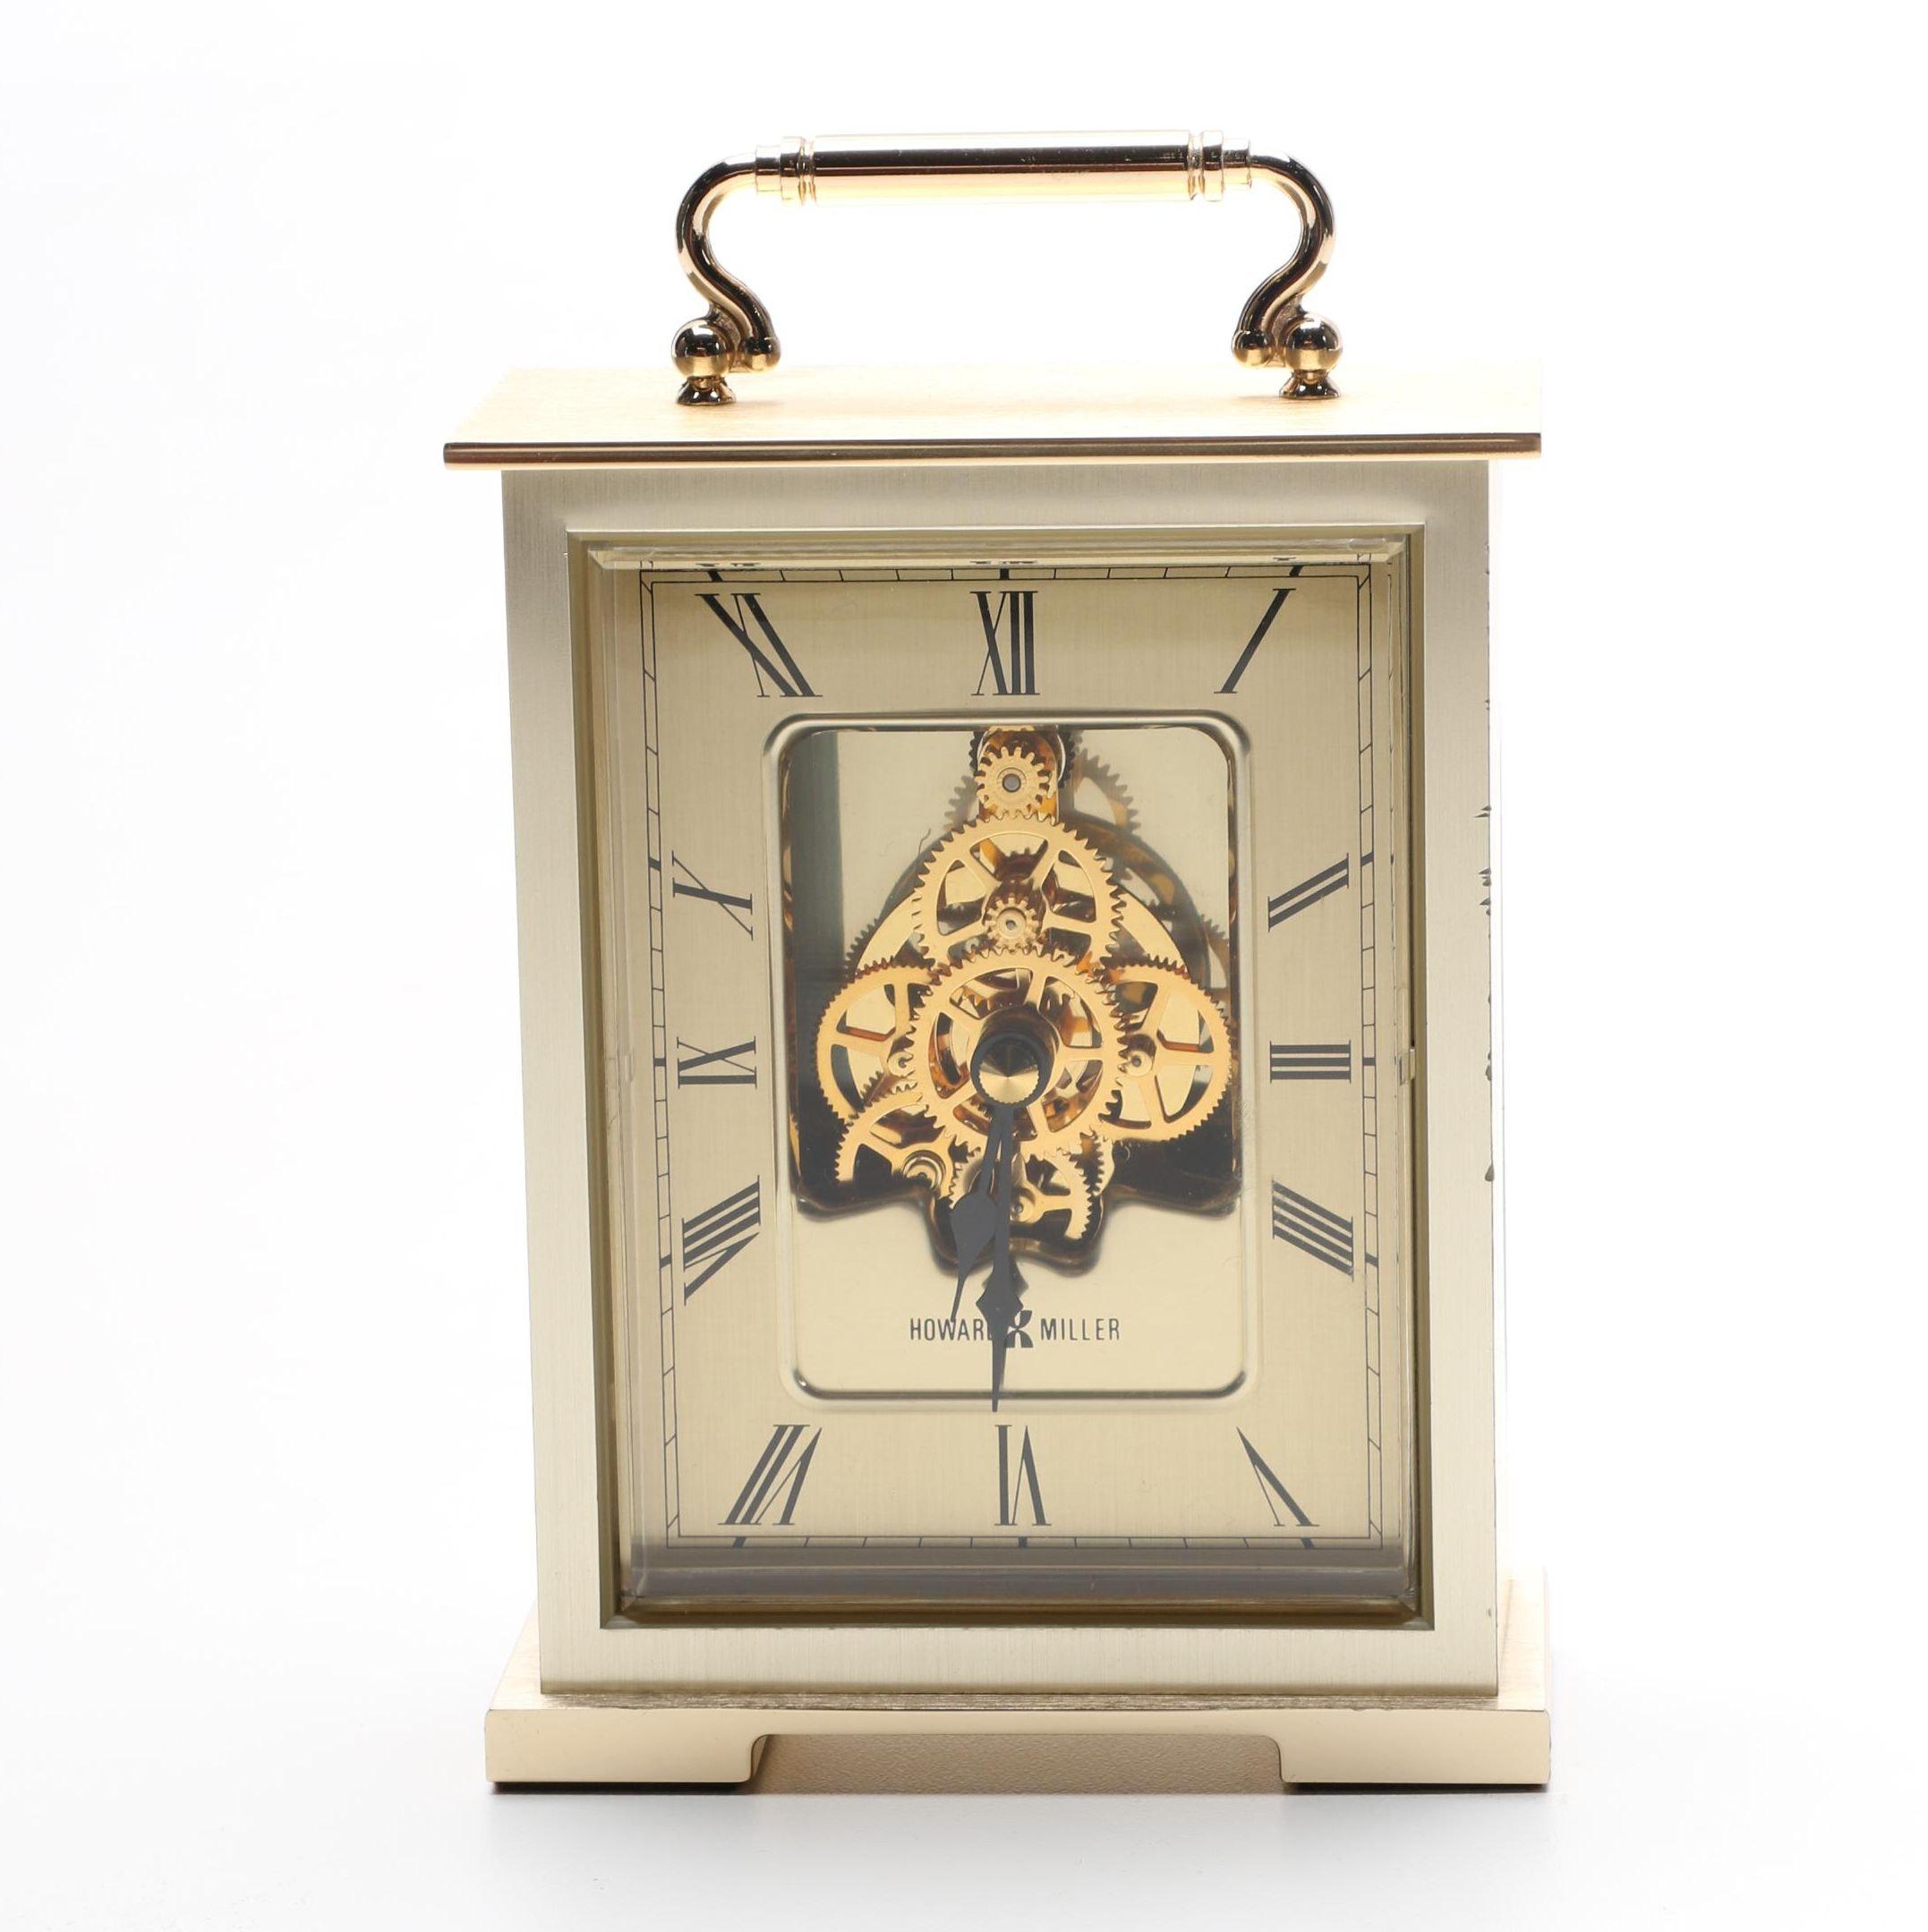 howard miller mantel clock - Howard Miller Mantel Clock